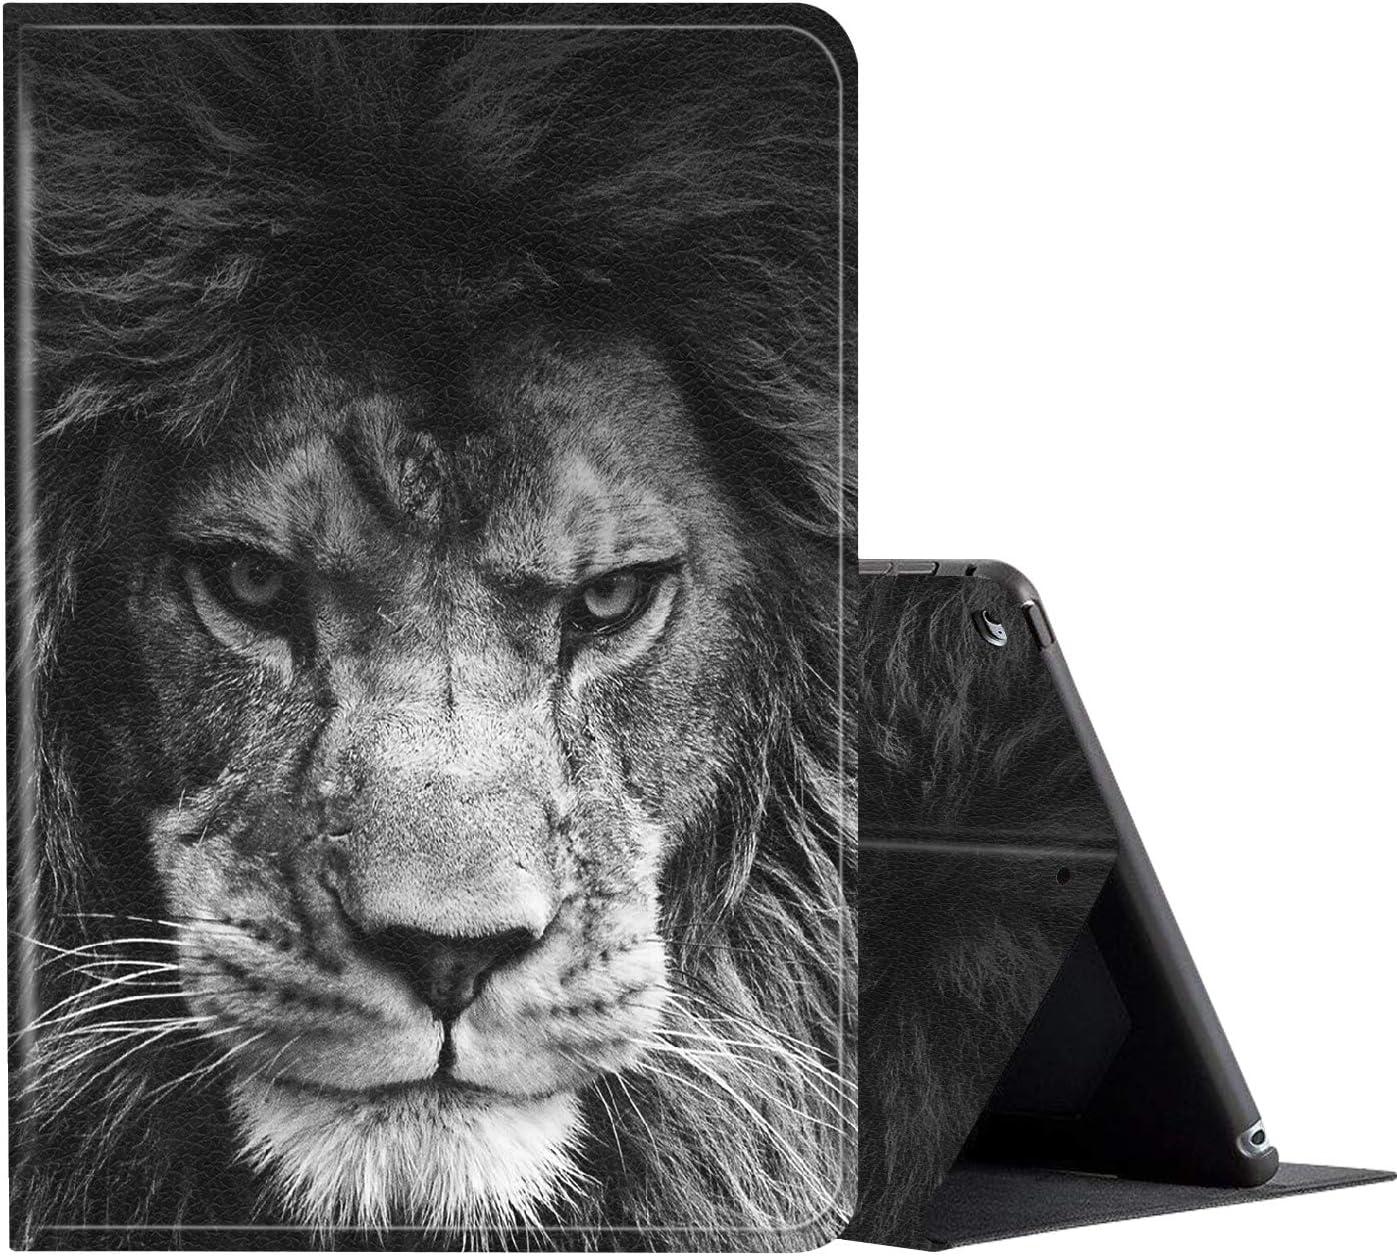 iPad 10.2 Case 2020 2019 8th 7th ipad Generation Max 43% OFF List price Ad Amook